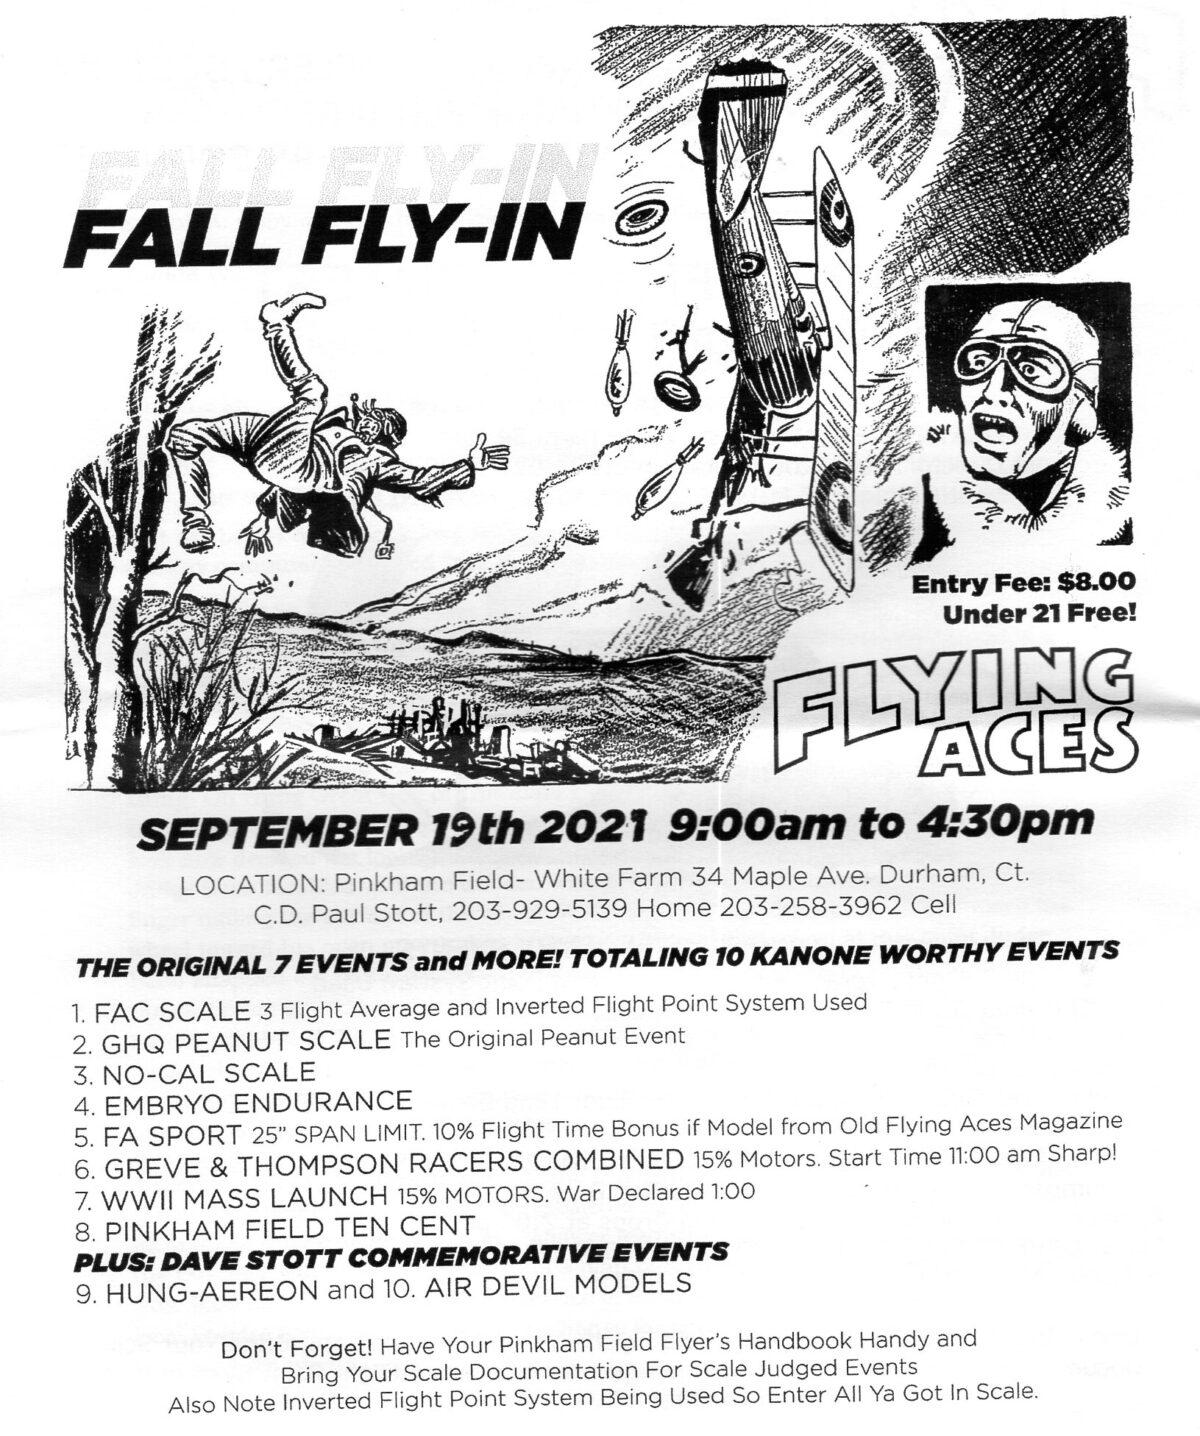 Pinkham Field Fall Fly-In, Durham CT Sunday 9/19